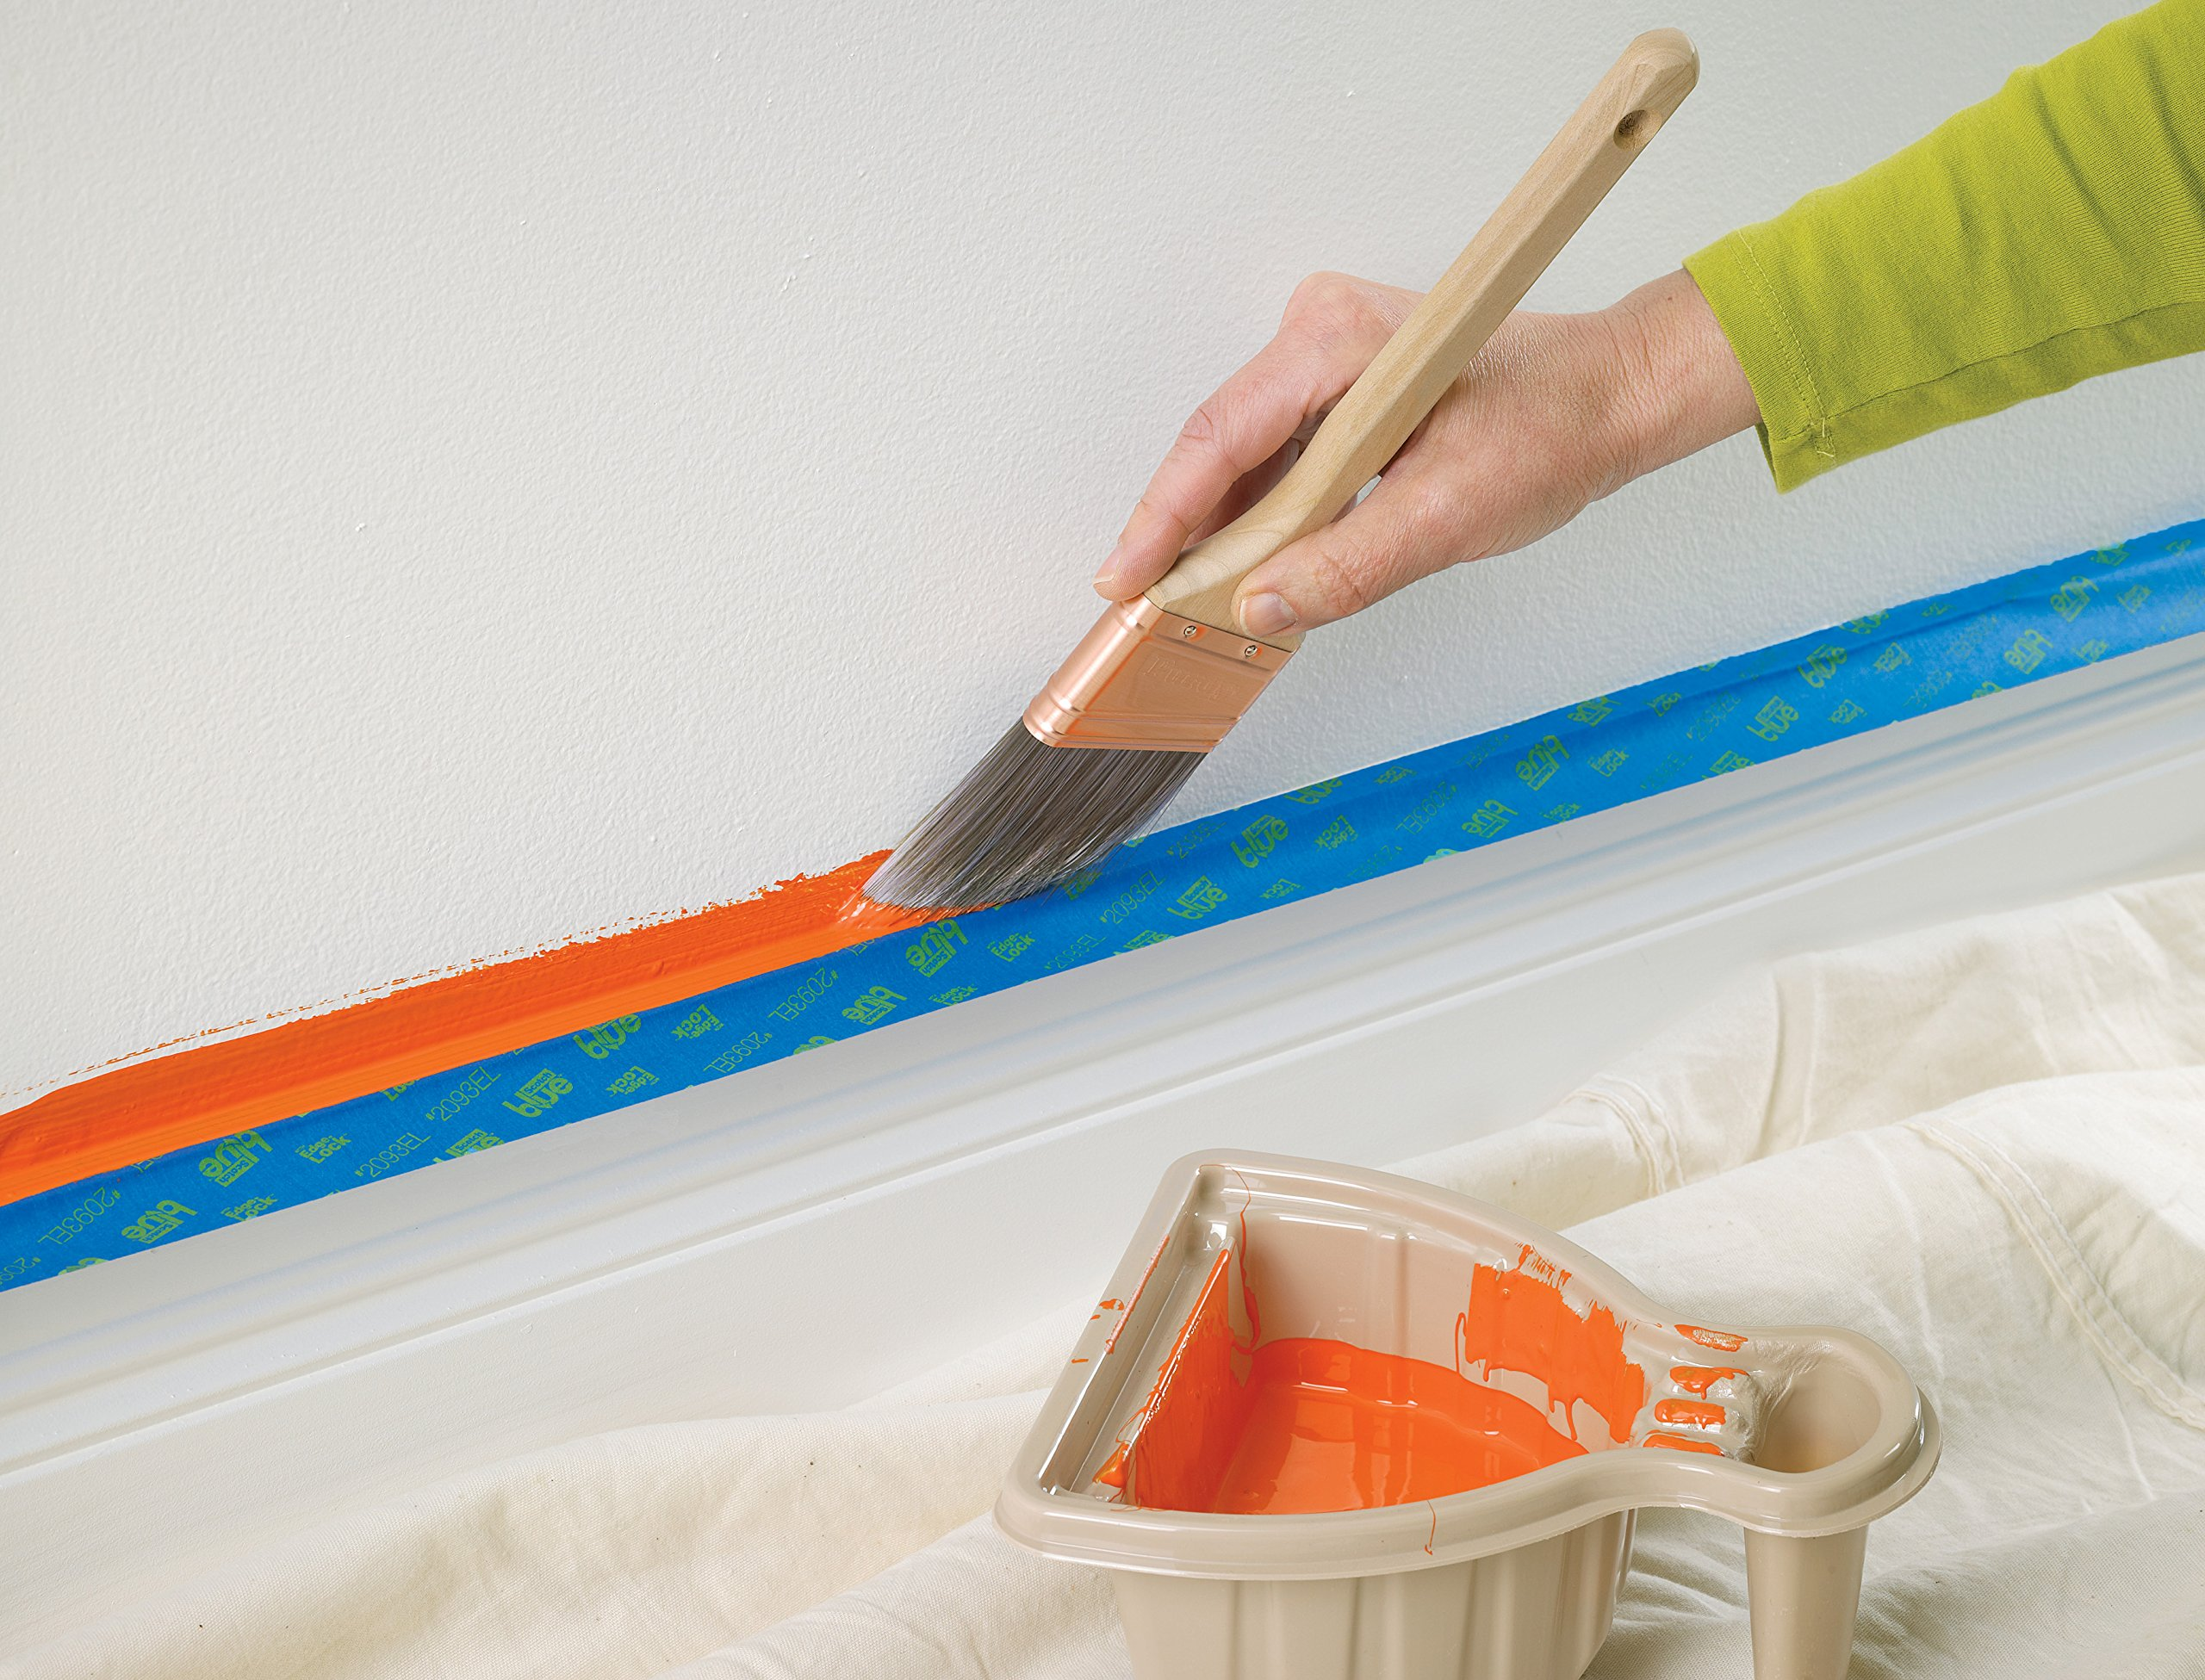 ScotchBlue 2093EL-24CVP Trim + BASEBOARDS Painters Tape.94 in x 60 yd, 3 Rolls, Blue by ScotchBlue (Image #9)